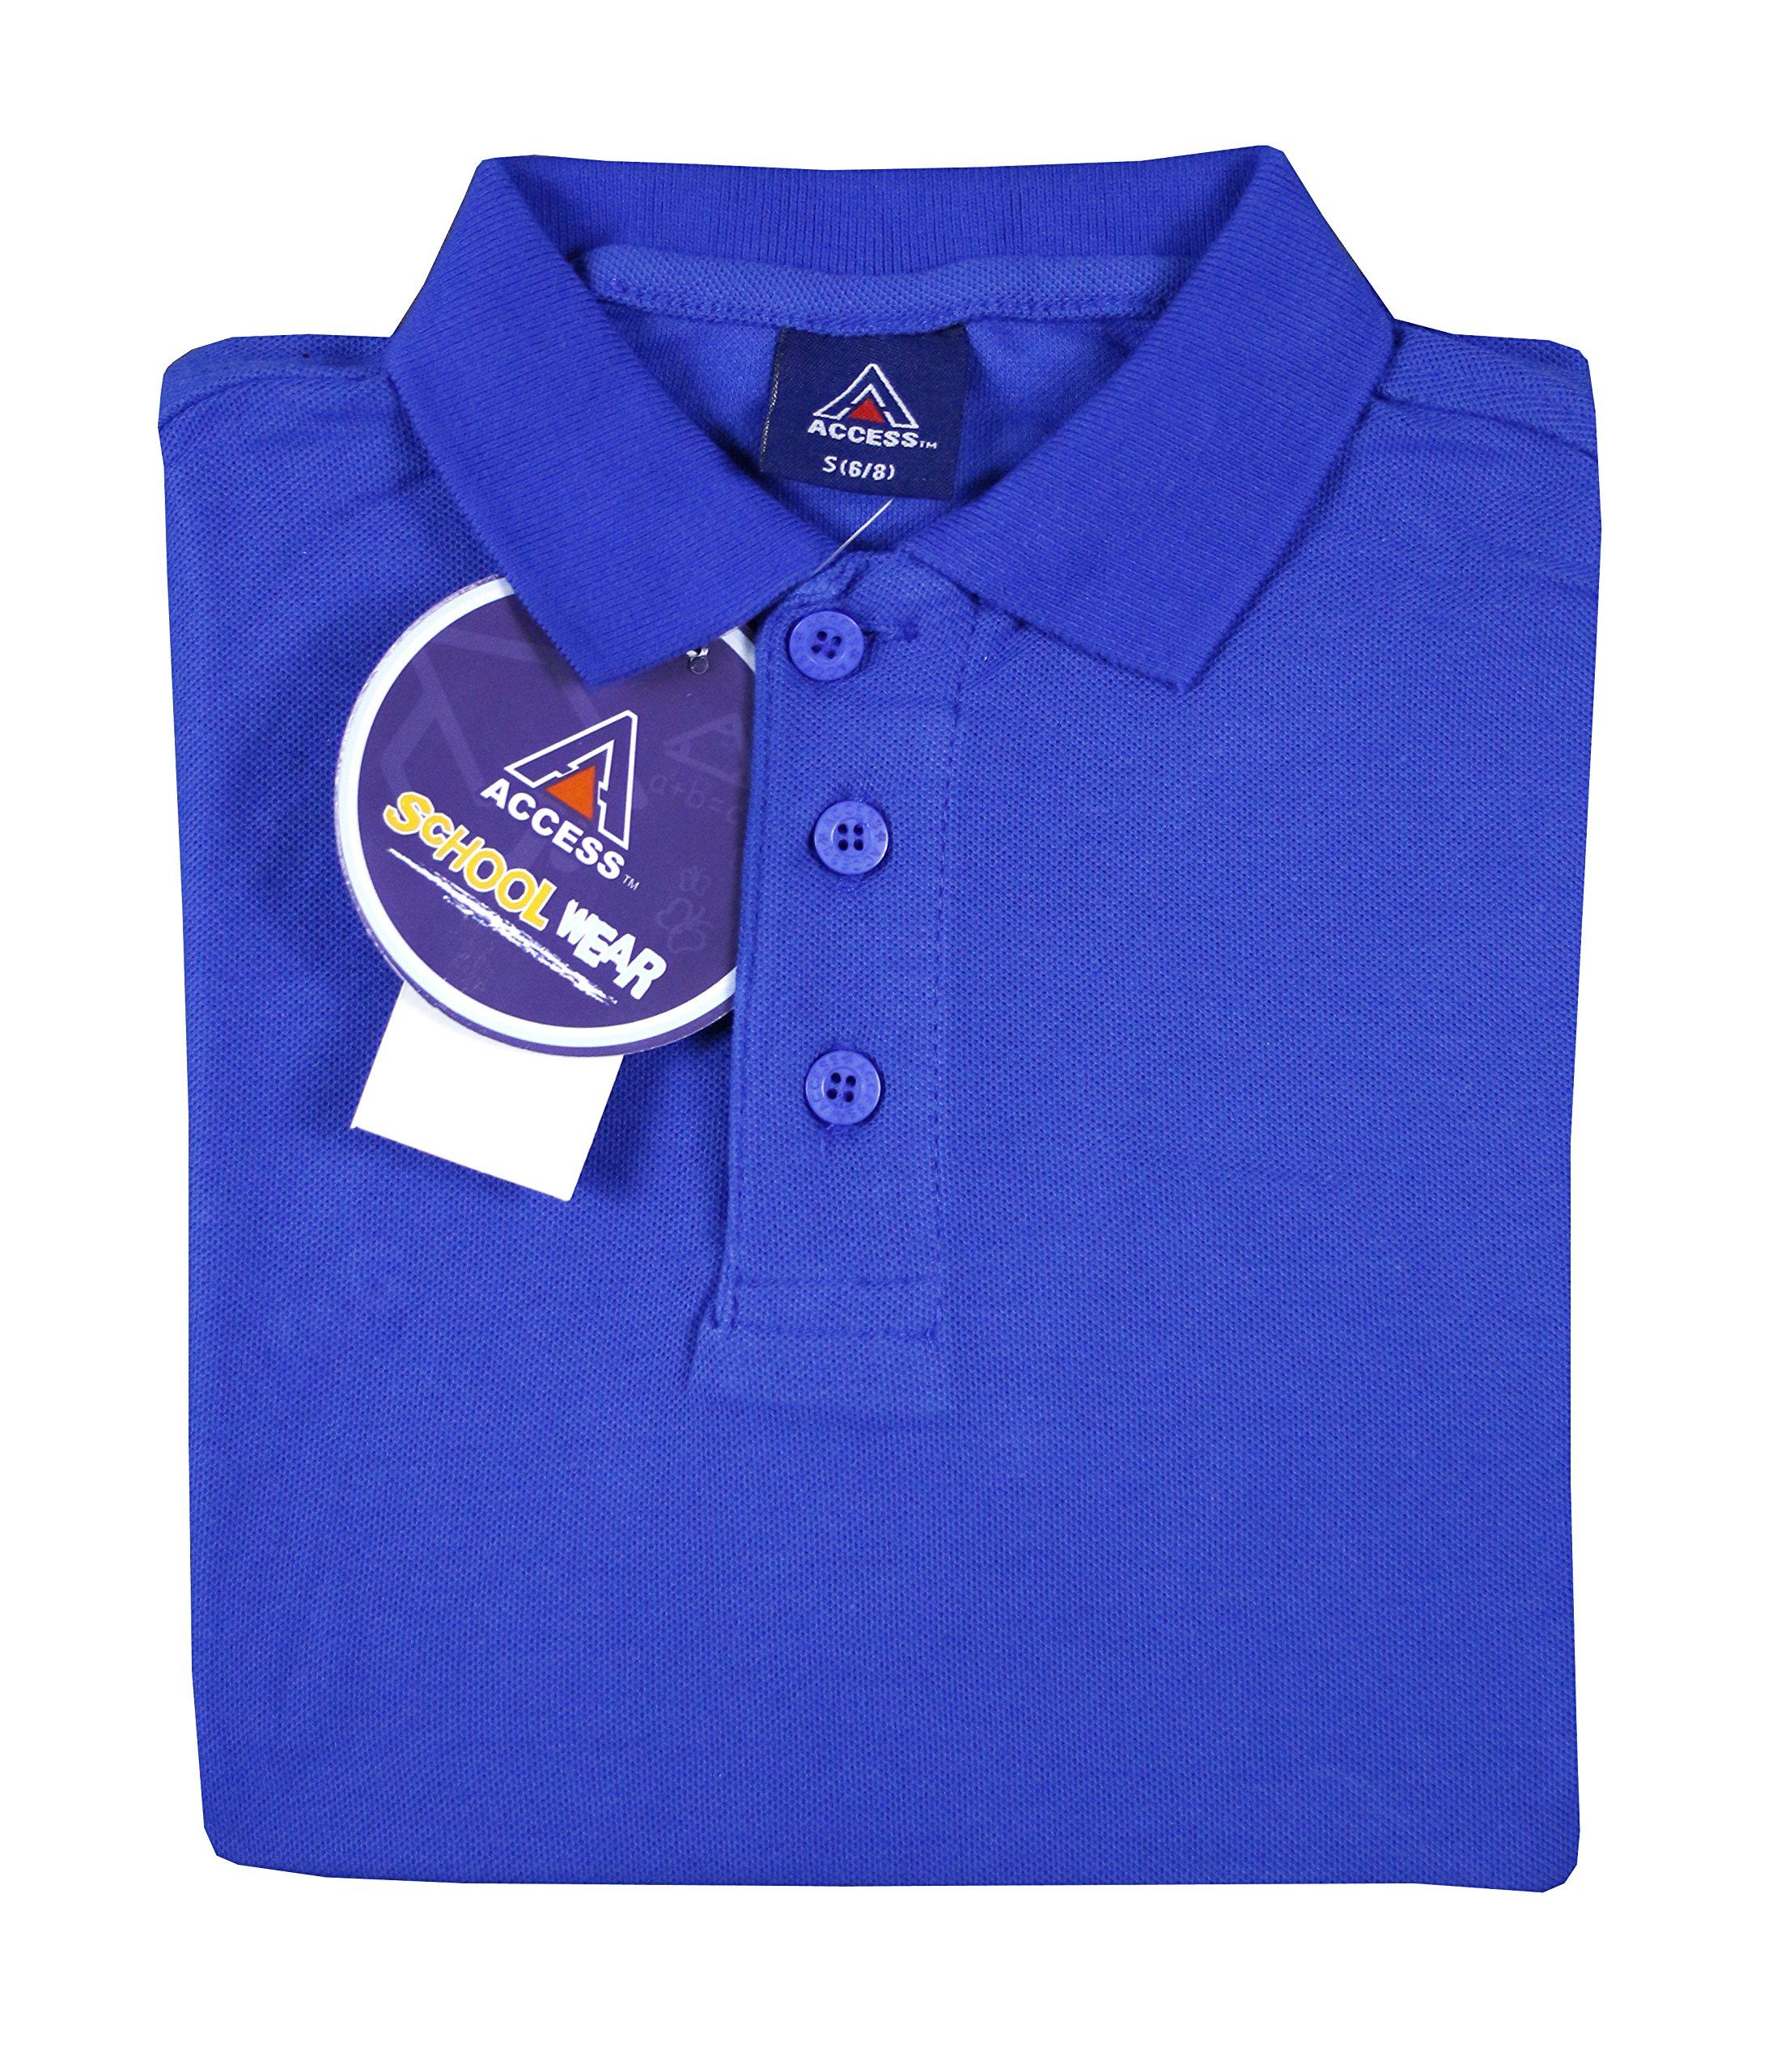 Access Unisex Kid's Short Sleeve School Uniform Pique Polo Royal S (6/8)